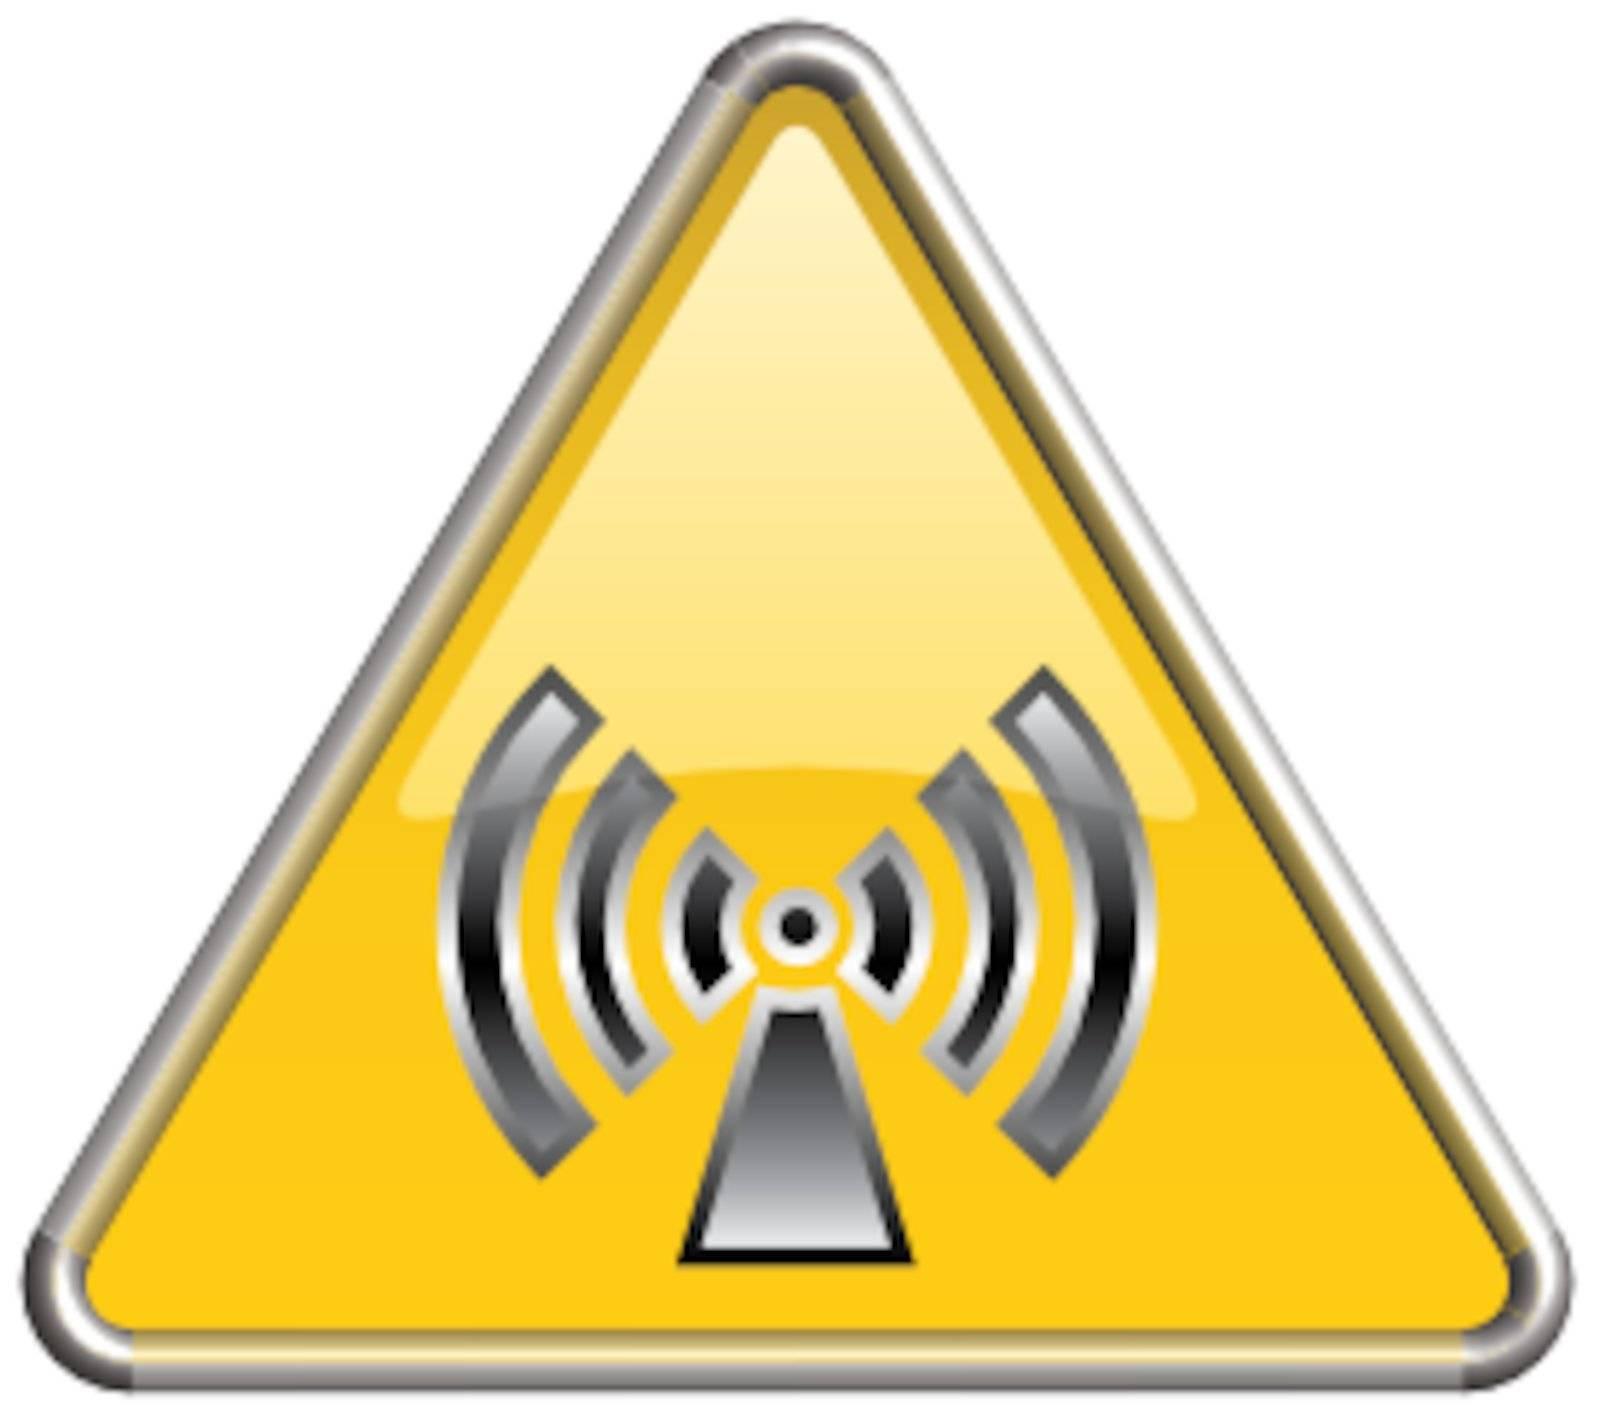 Biohazart symbol/ icon in yellow 3D triangle